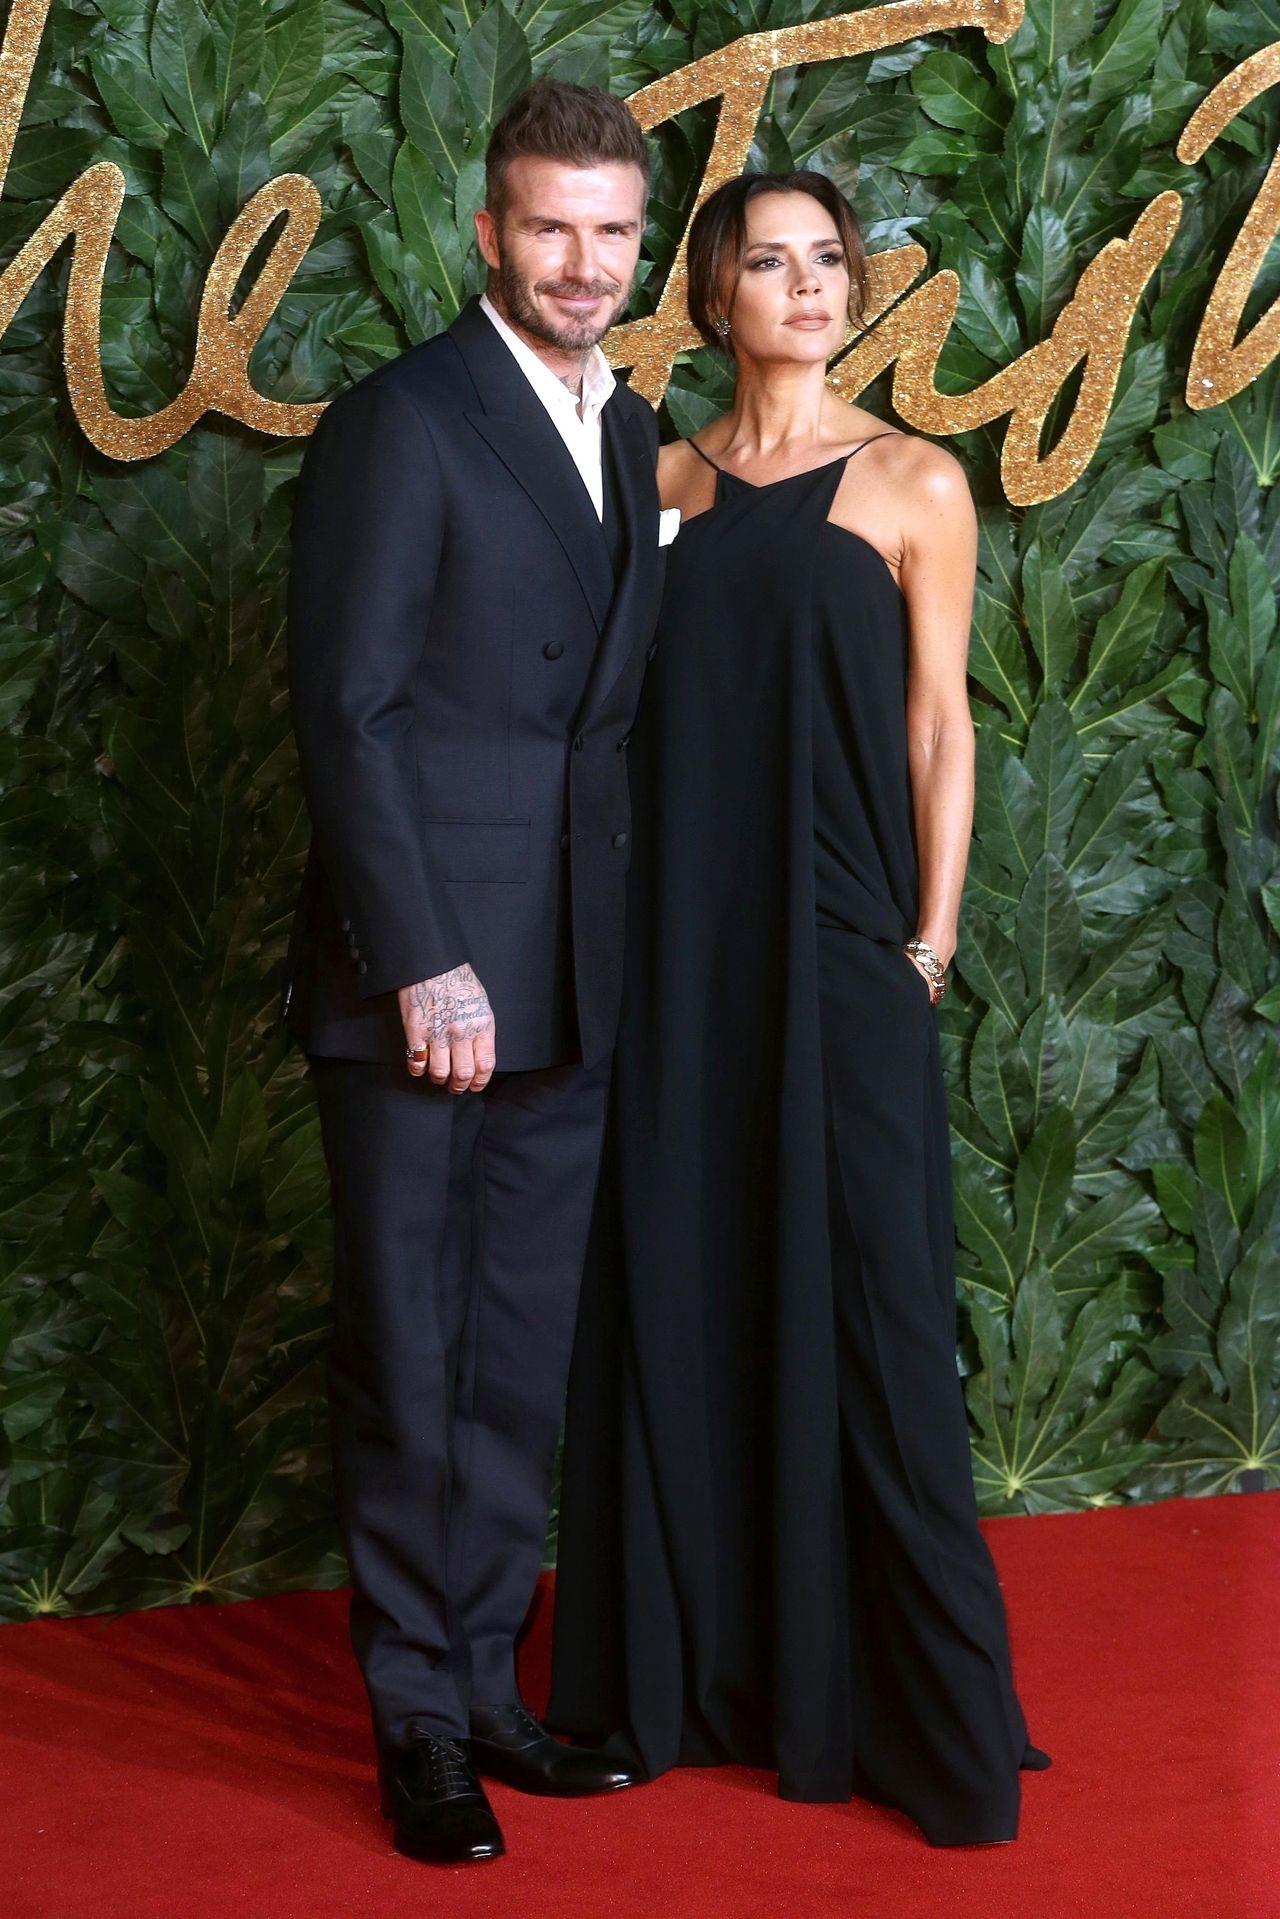 The British Fashion Awards, Arrivals, Royal Albert Hall, London, UK / BACKGRID , kod: David Beckham, Victoria Beckham